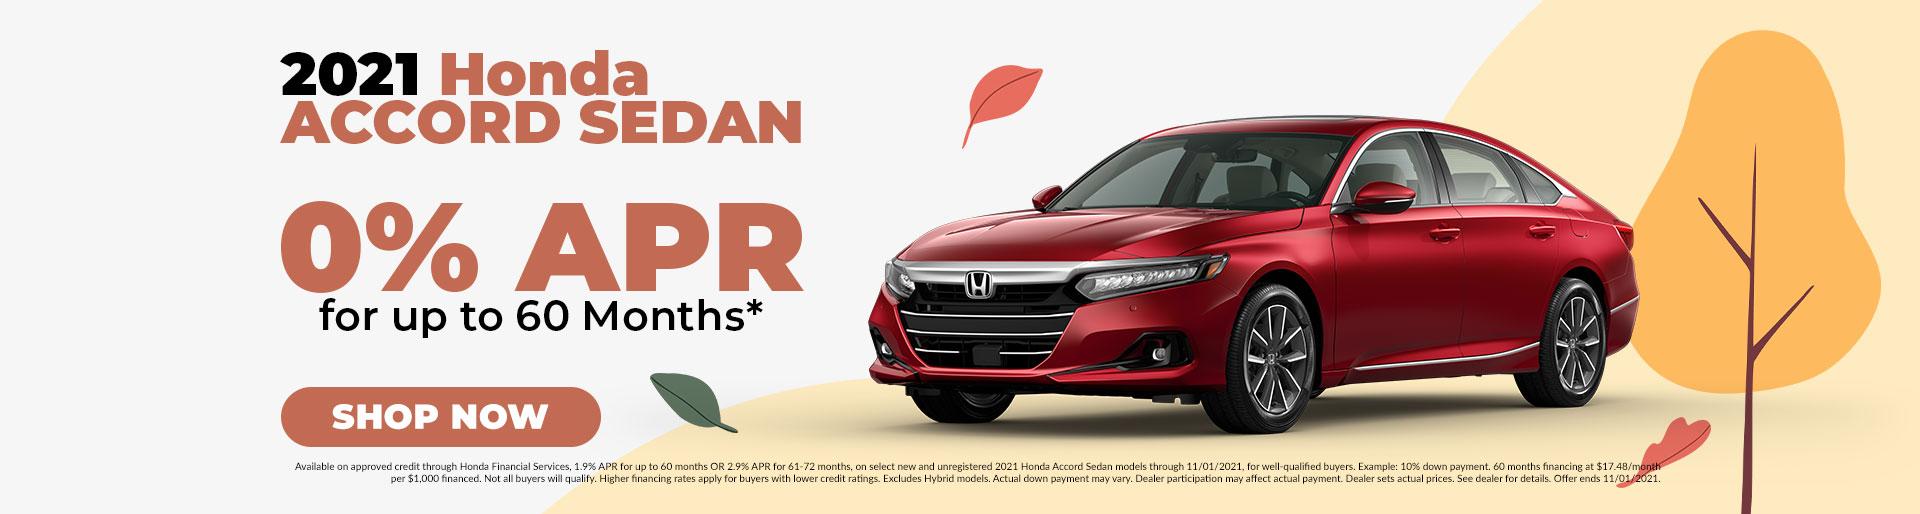 2021 Honda Accord Sedan Offer in Jefferson City, MO